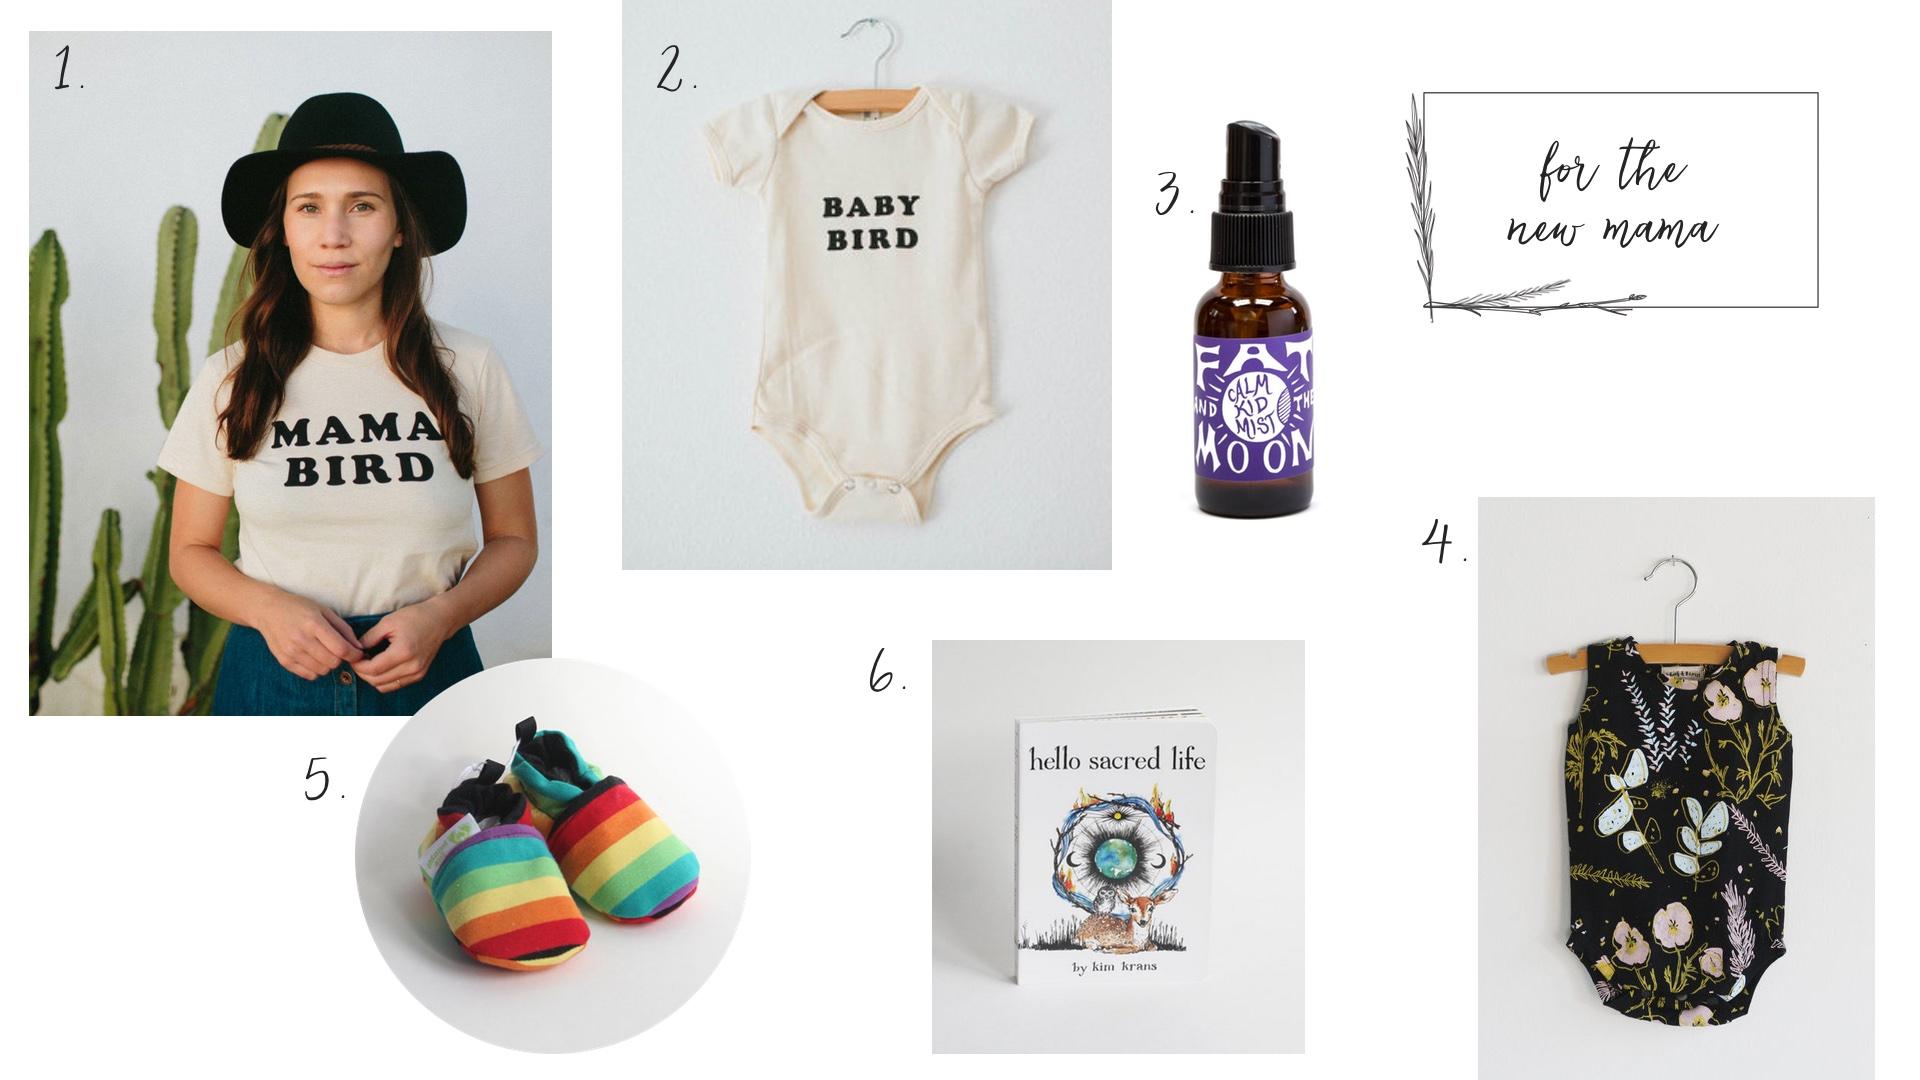 1.  Mama Bird Tee  2.  Baby Bird Onesie  3.  Calm Kid Mist  4.  Desert Floral Onesie  5.  Rainbow Booties  6.  Hello Sacred Life